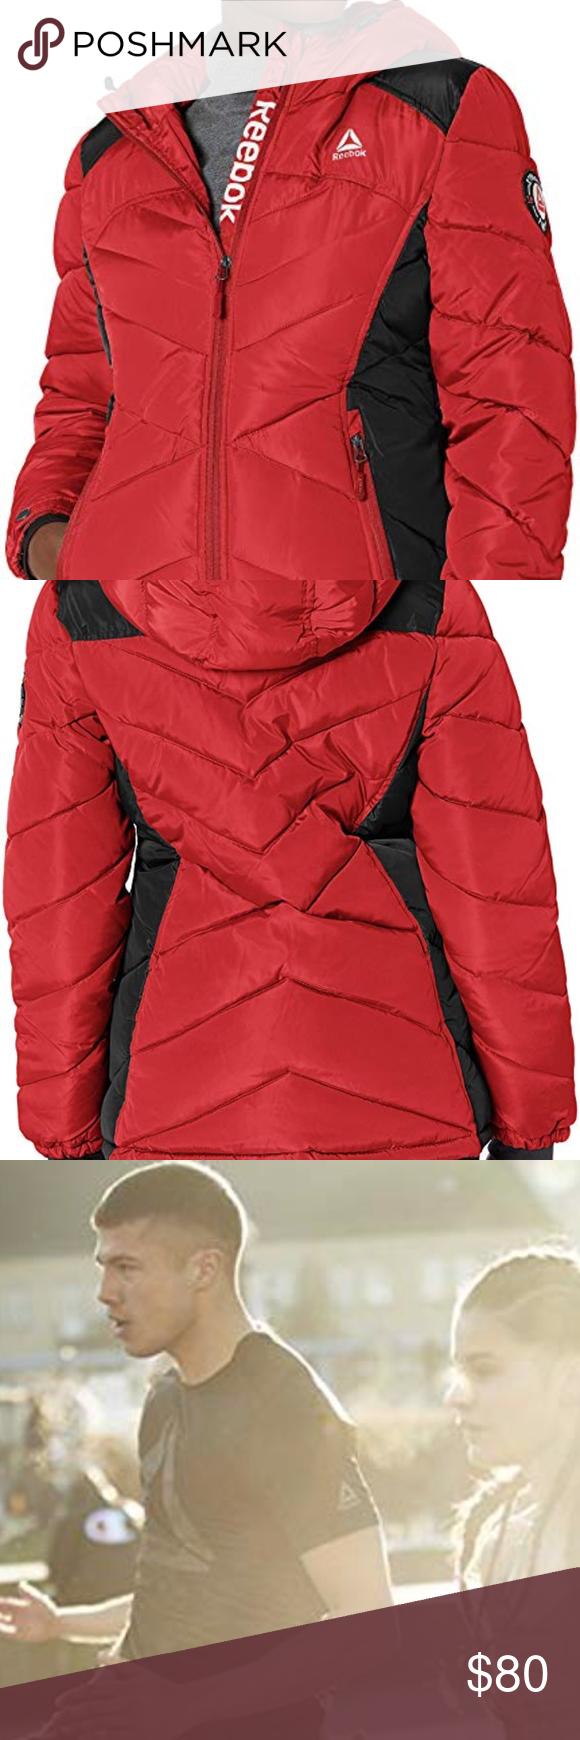 Reebok Women S Red Standard Puffer Jacket Olrb867h Lady In Red Reebok Women Active Fashion [ 1740 x 580 Pixel ]